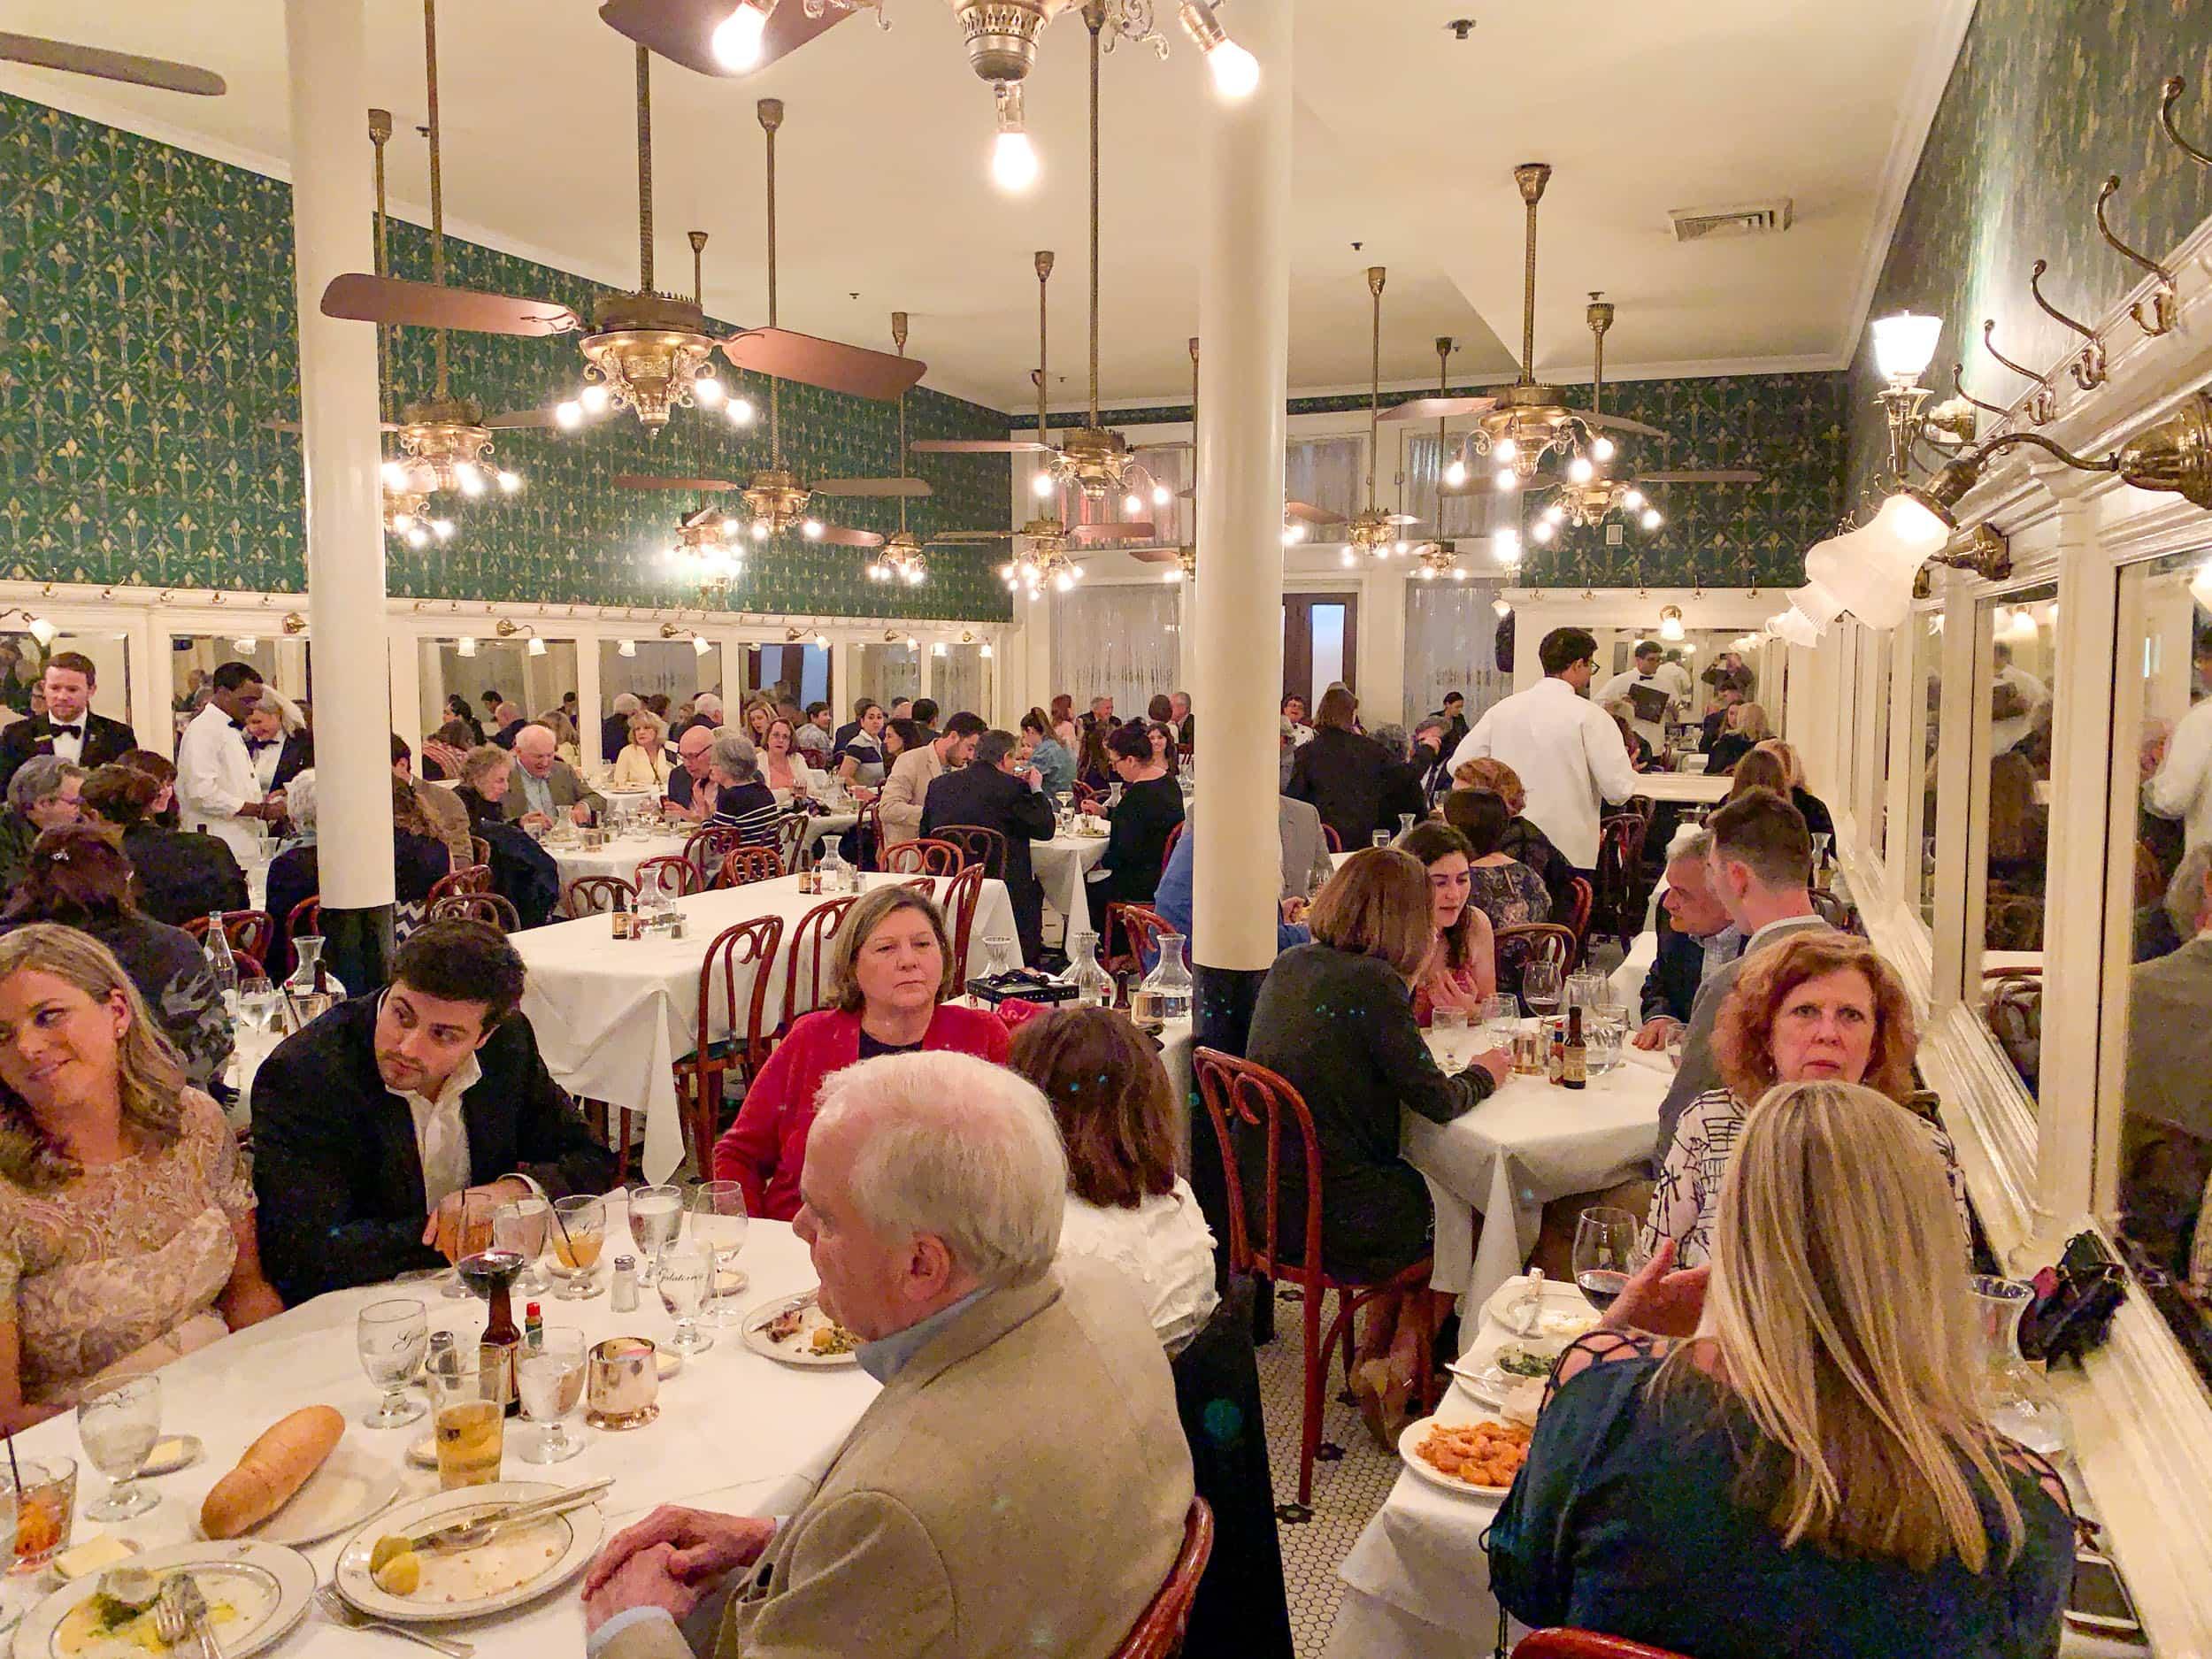 Galatoire's is the best restaurant on Bourbon Street